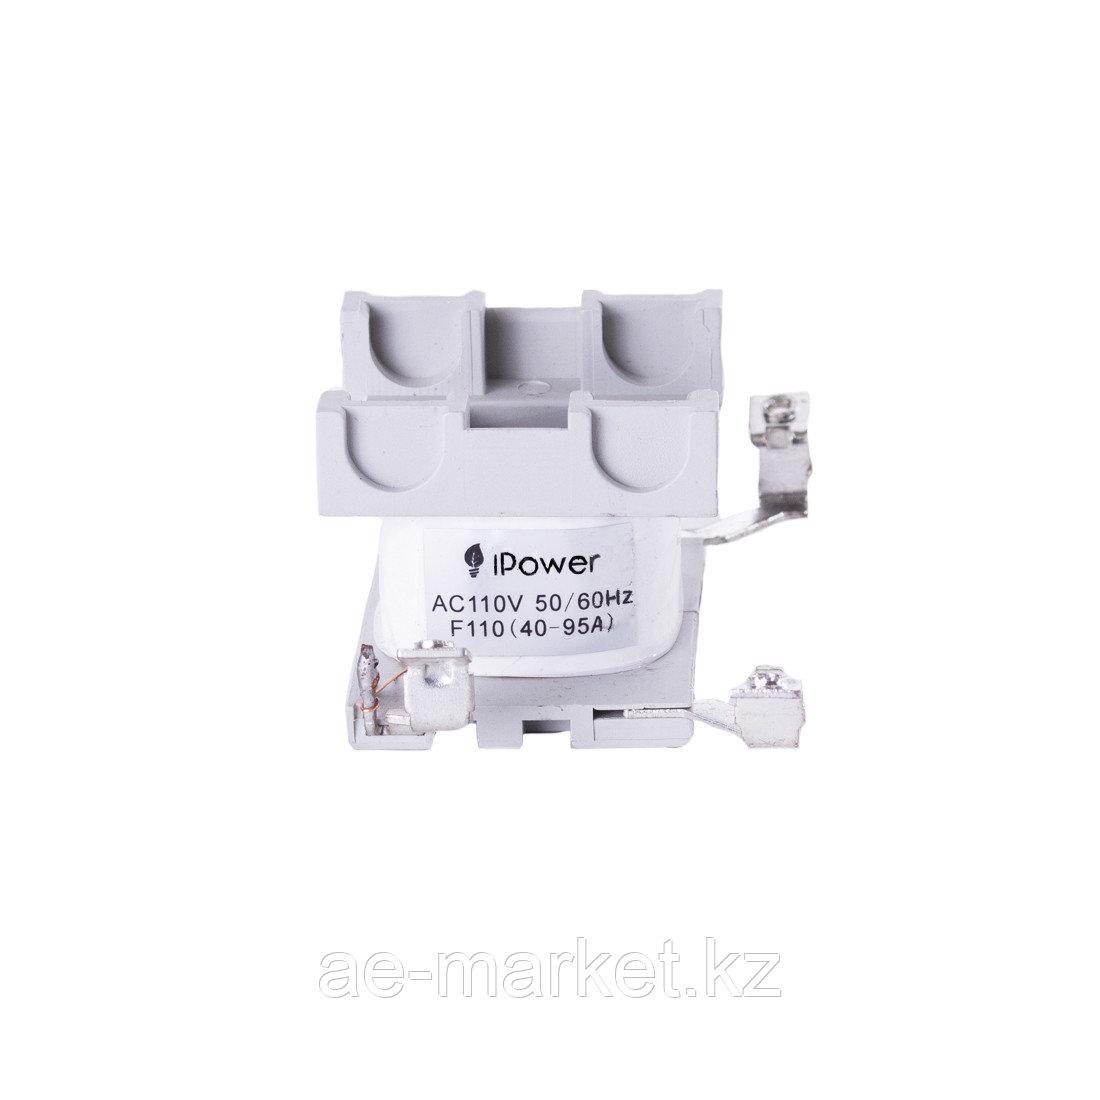 Катушка управления iPower F24 (40-95А) АС 24V